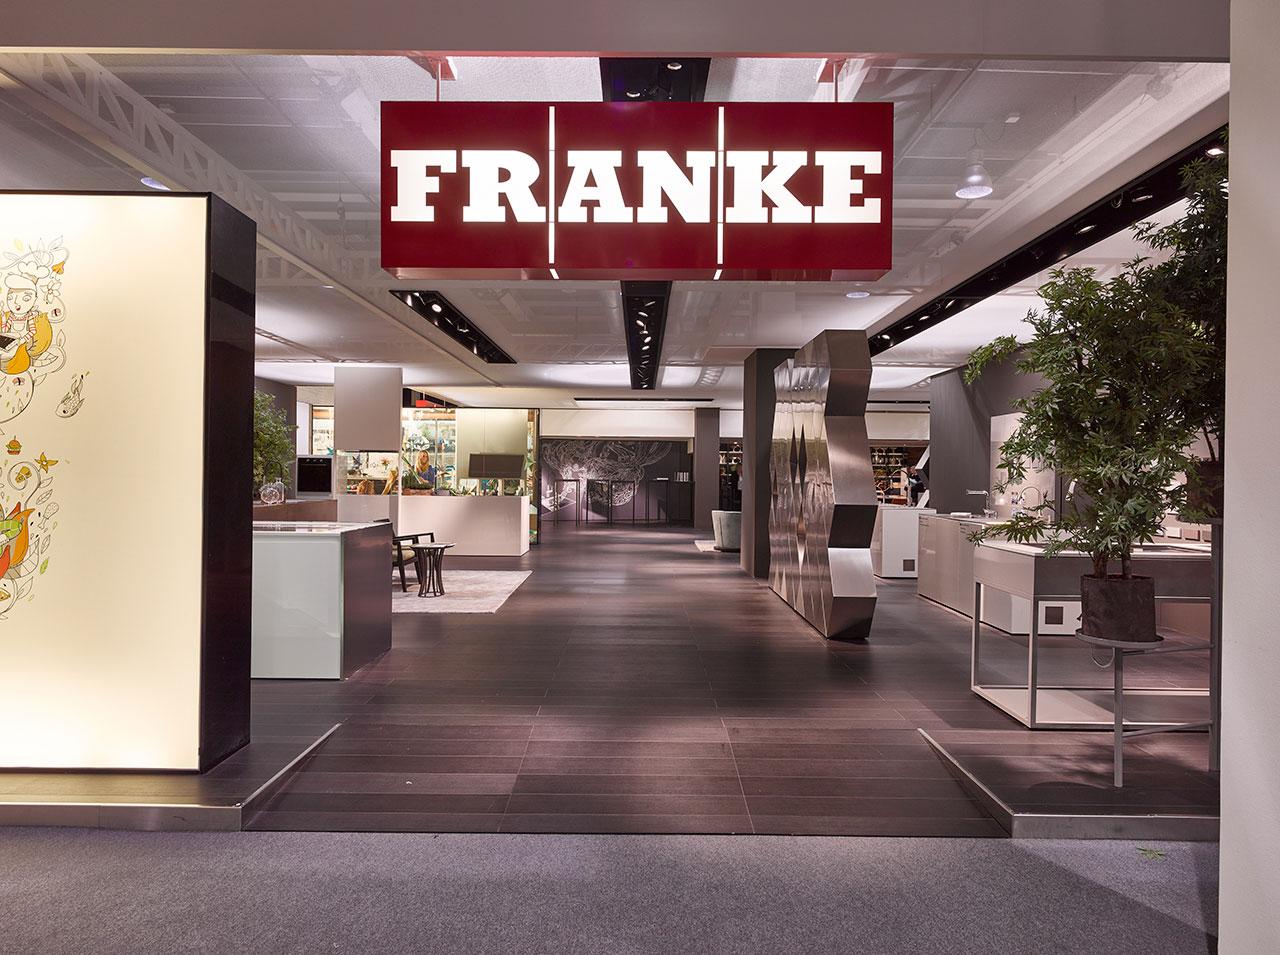 12-Franke-Swissbau-2016-Basilea